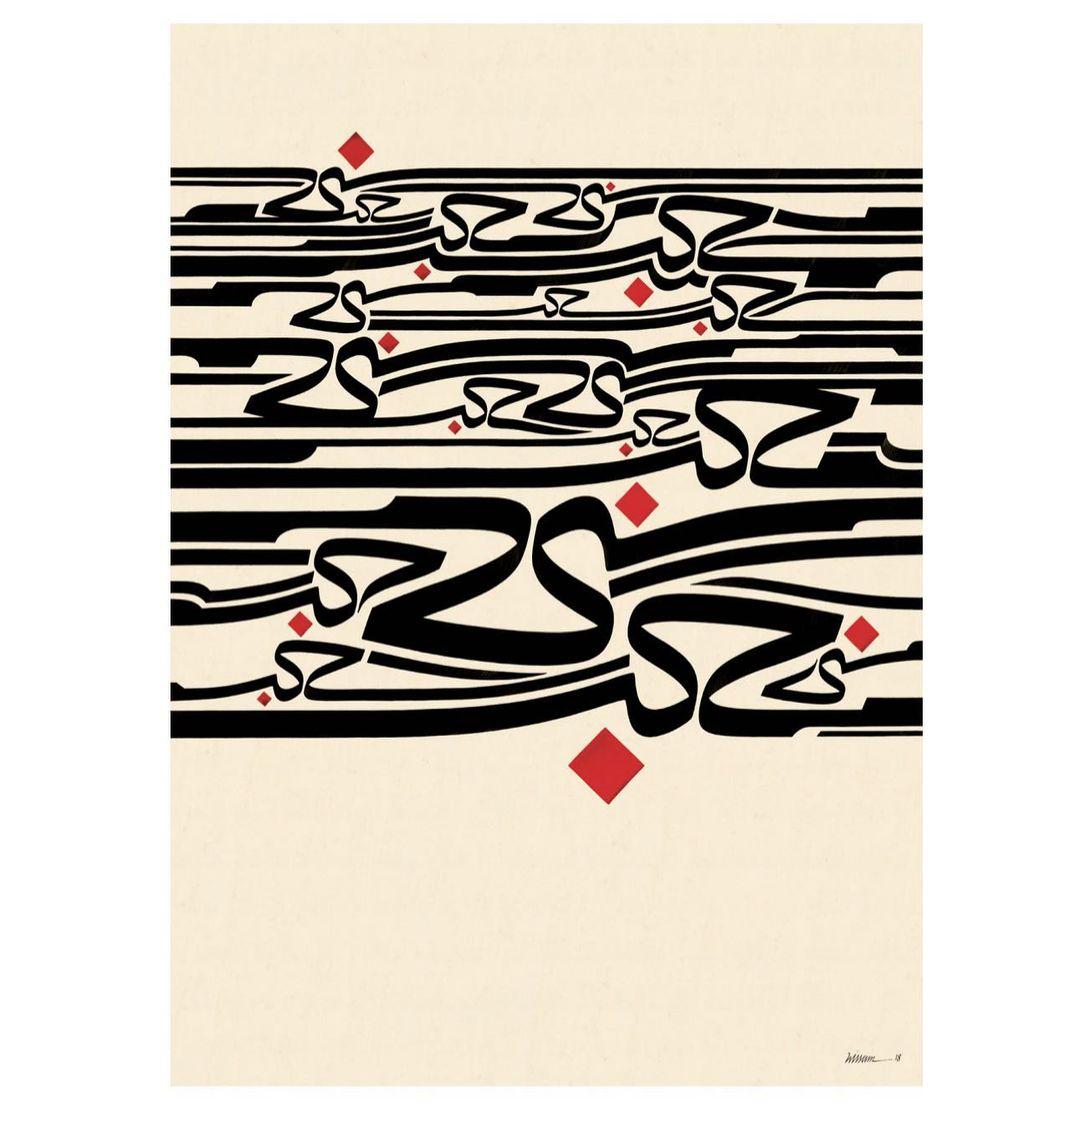 Download Kaligrafi Karya Kaligrafer Kristen Lost in Love 2 ! #wissamshawkat #art #wissam_shawkat #design #mestariagallery #a...-Wissam 1